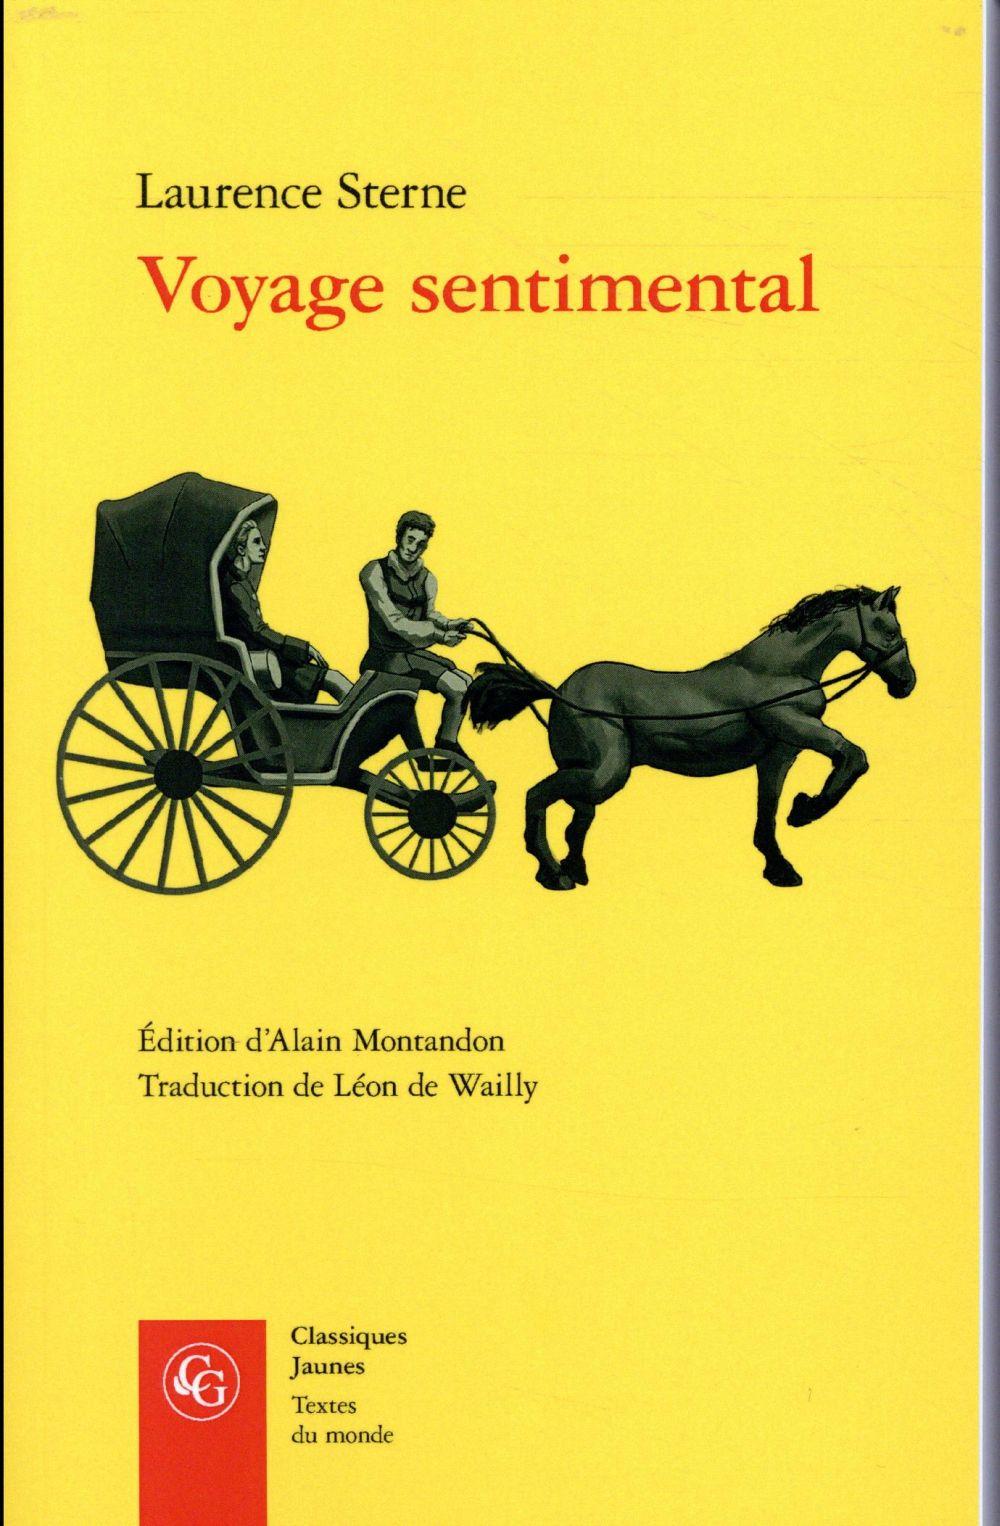 Voyage sentimental